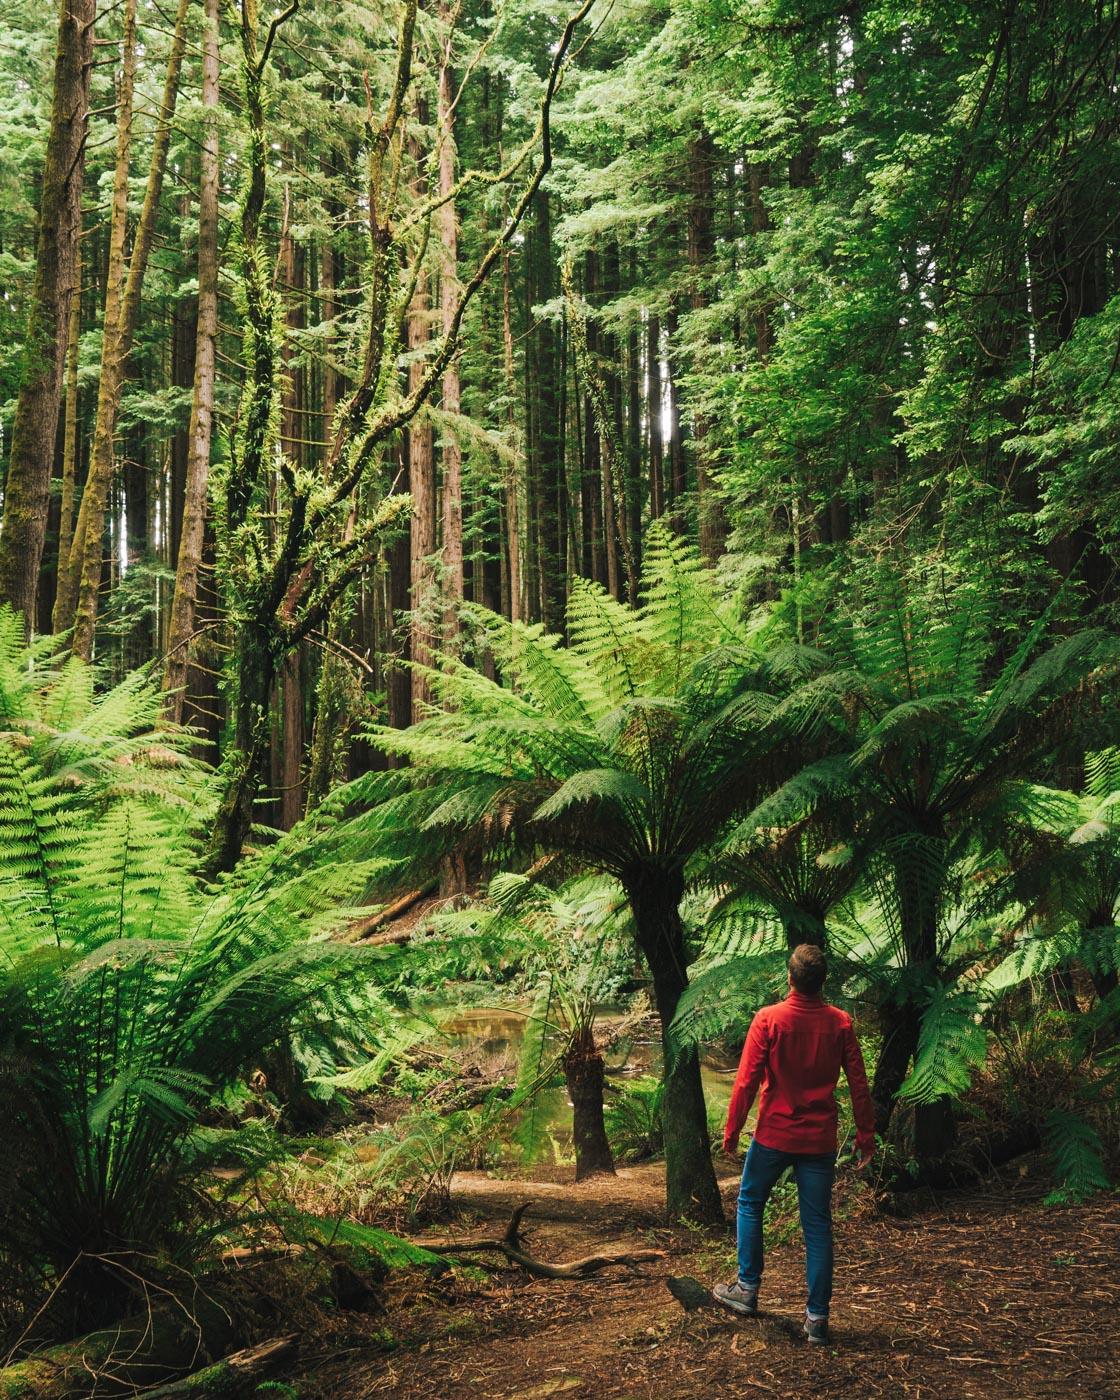 Otways-Forest-California-Redwoods.jpg